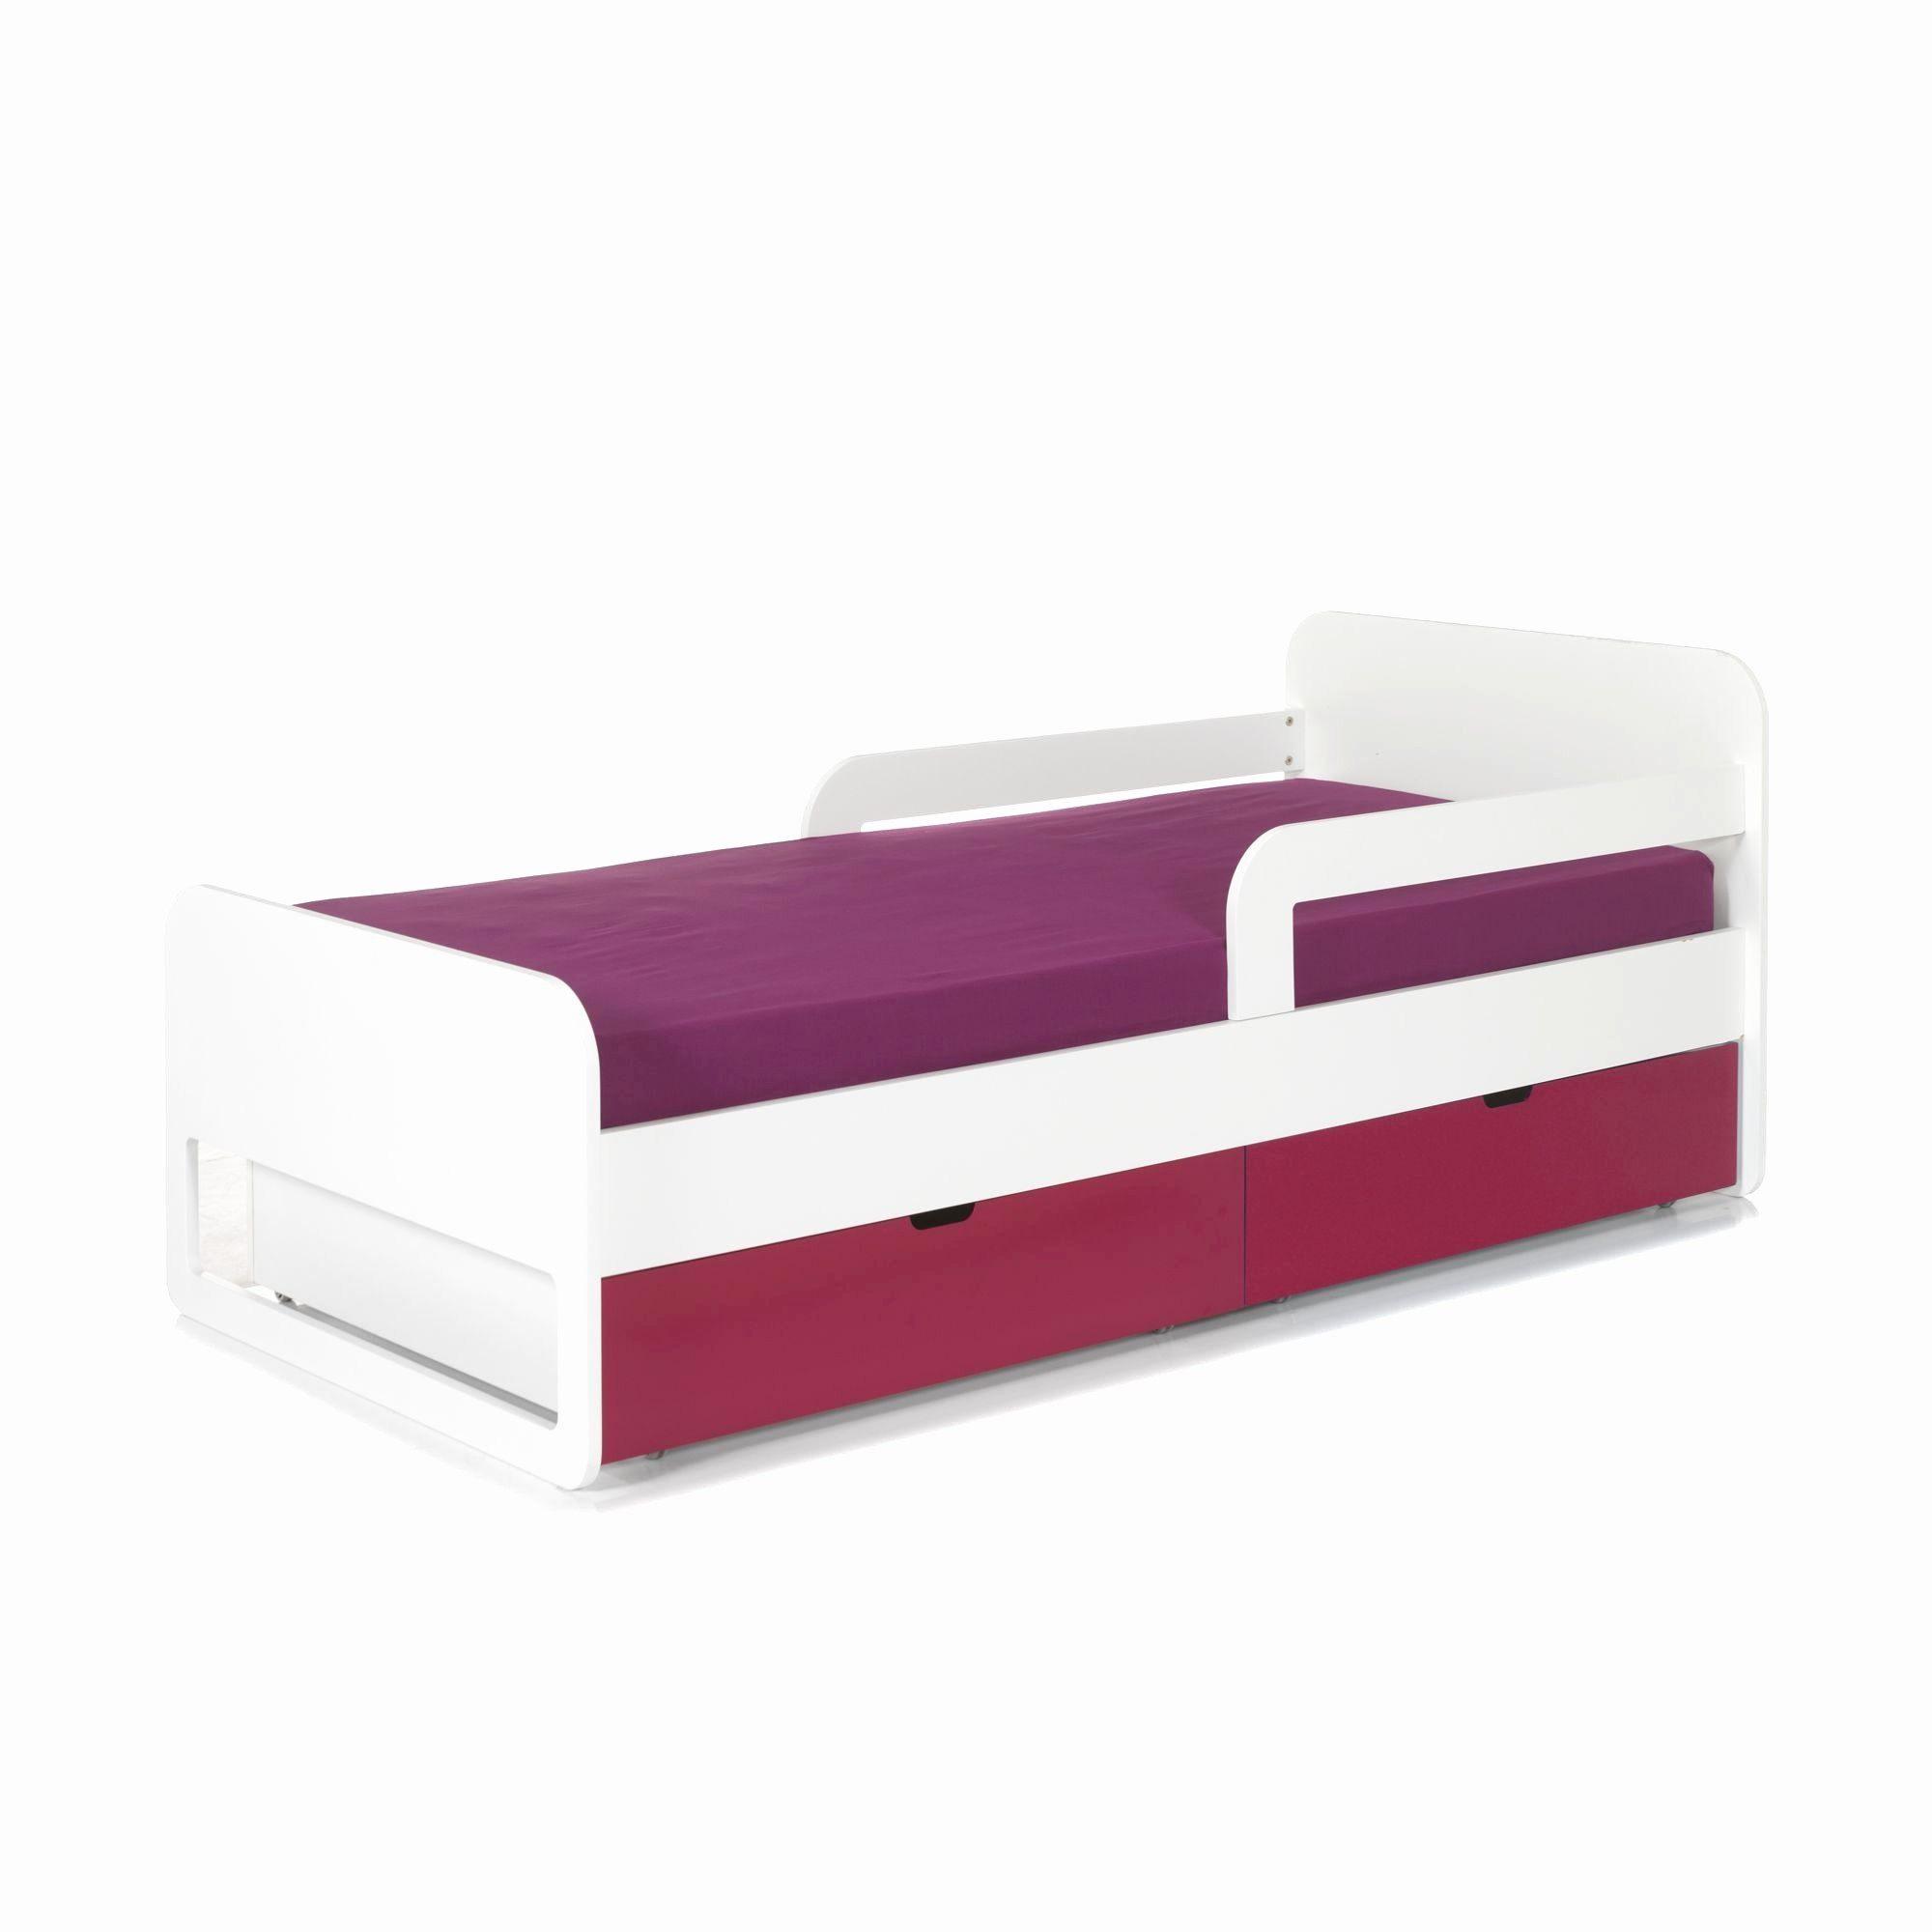 Ikea Lit Gigogne Adulte Inspirational 49 Luxe S De Lit Tiroir 2